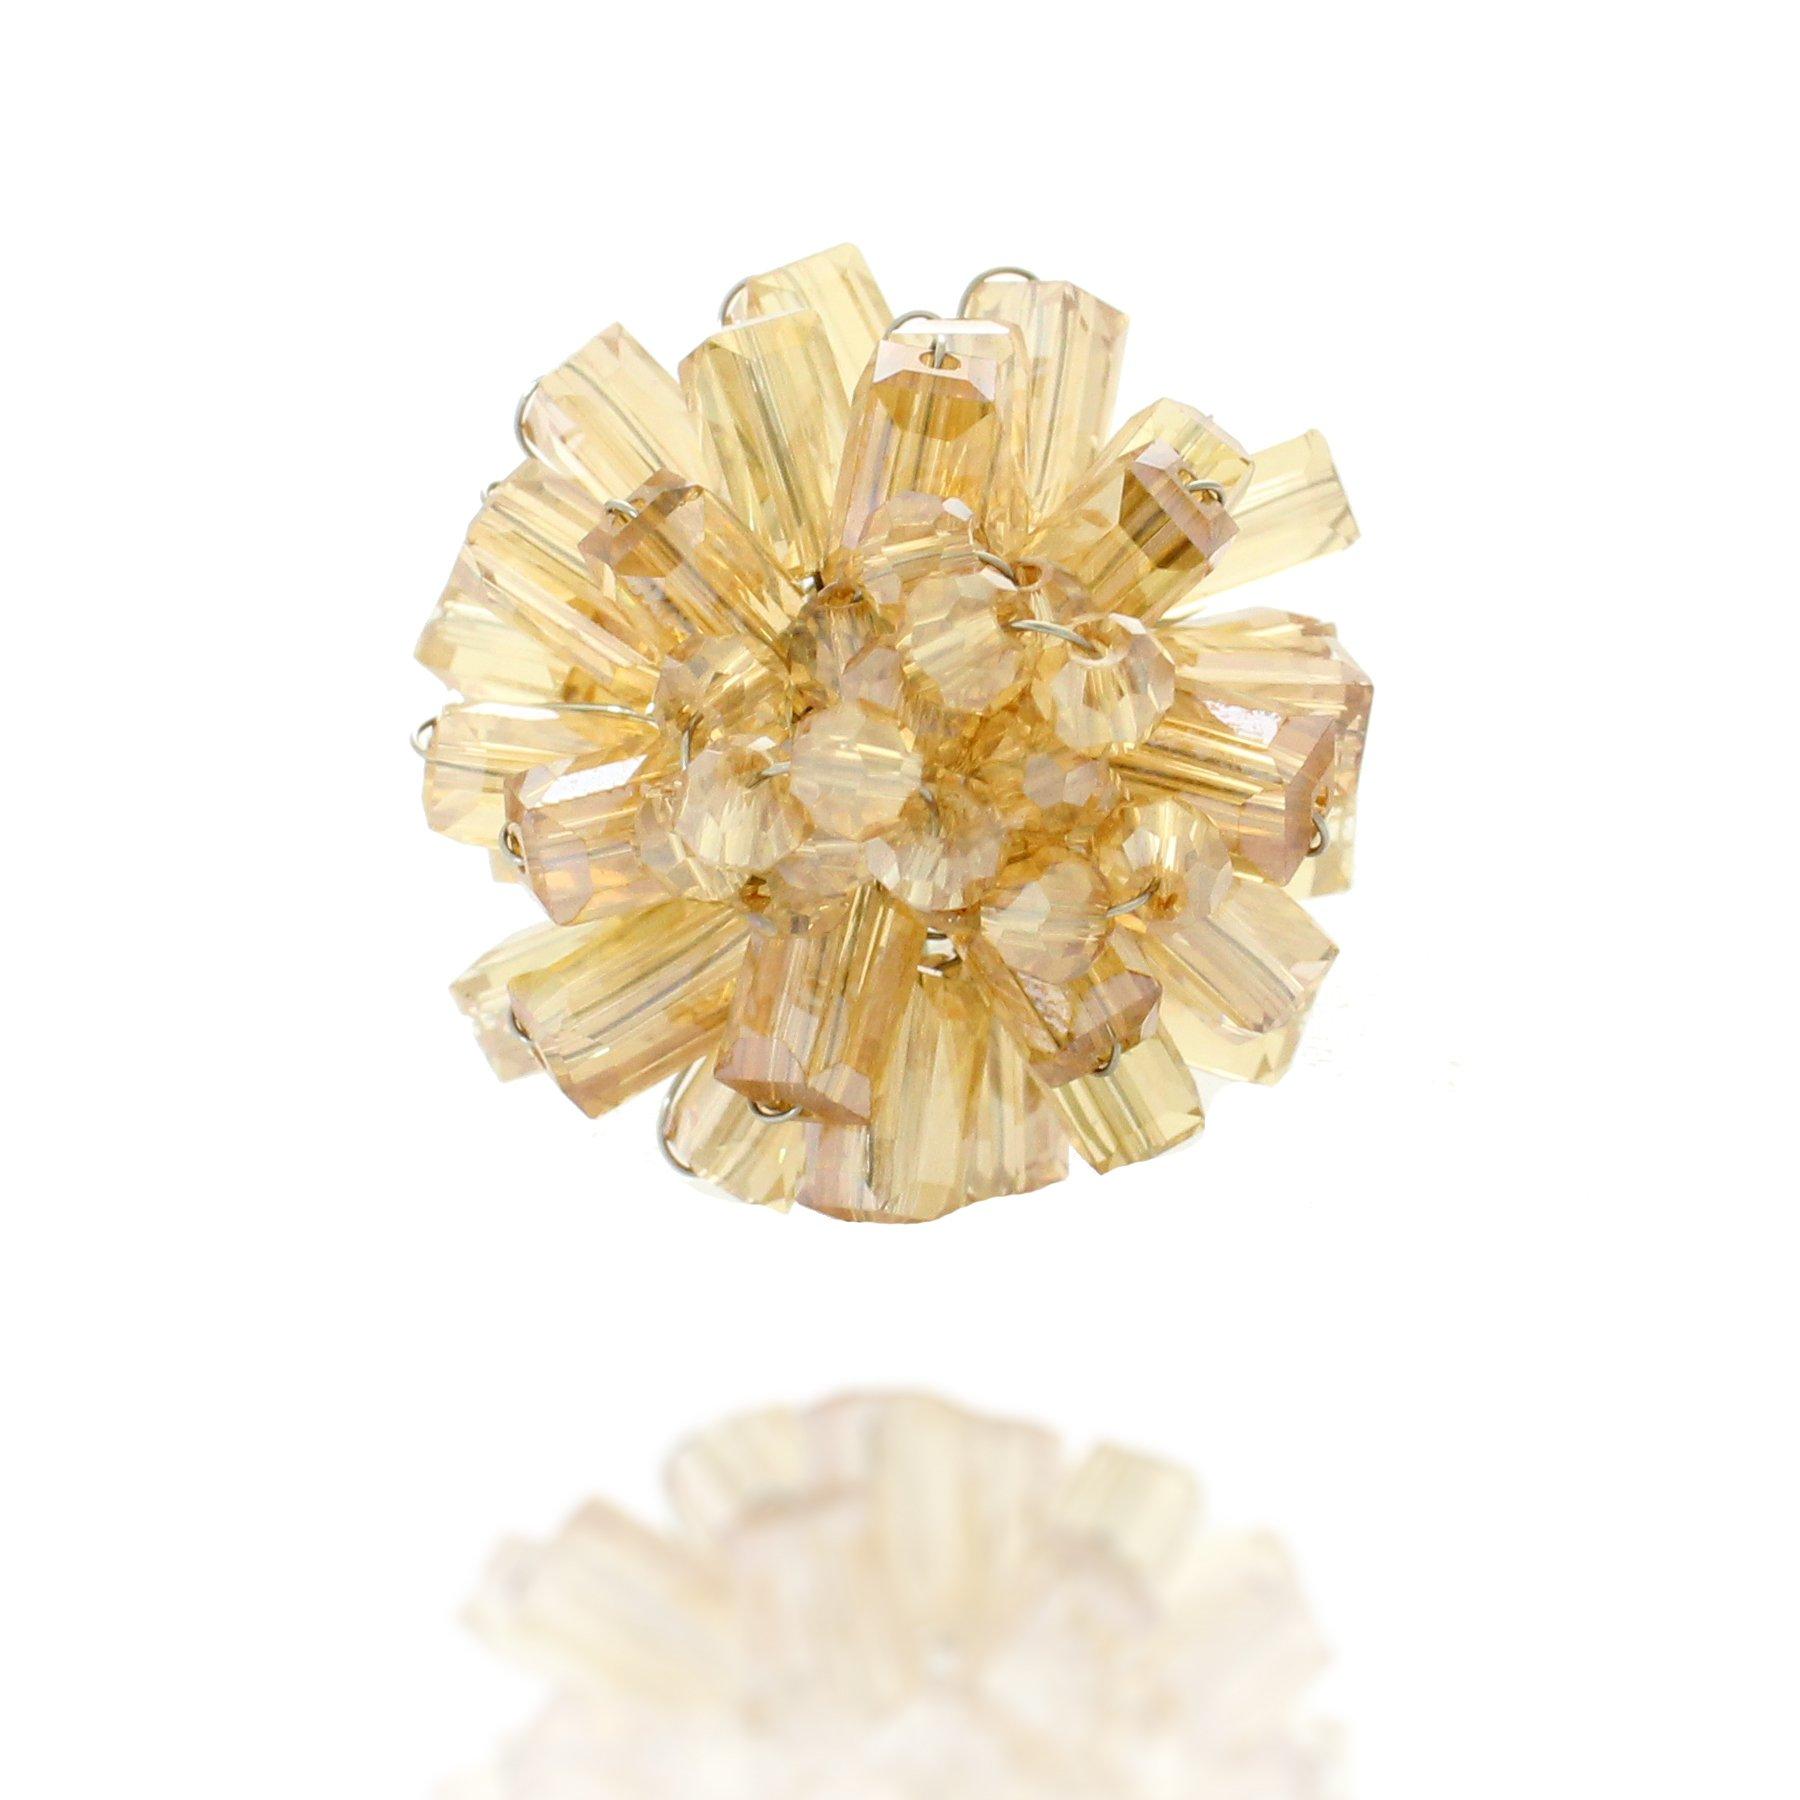 Chuvora Zinc Handwired Yellow Crystal Glass Beads Adjustable Ring